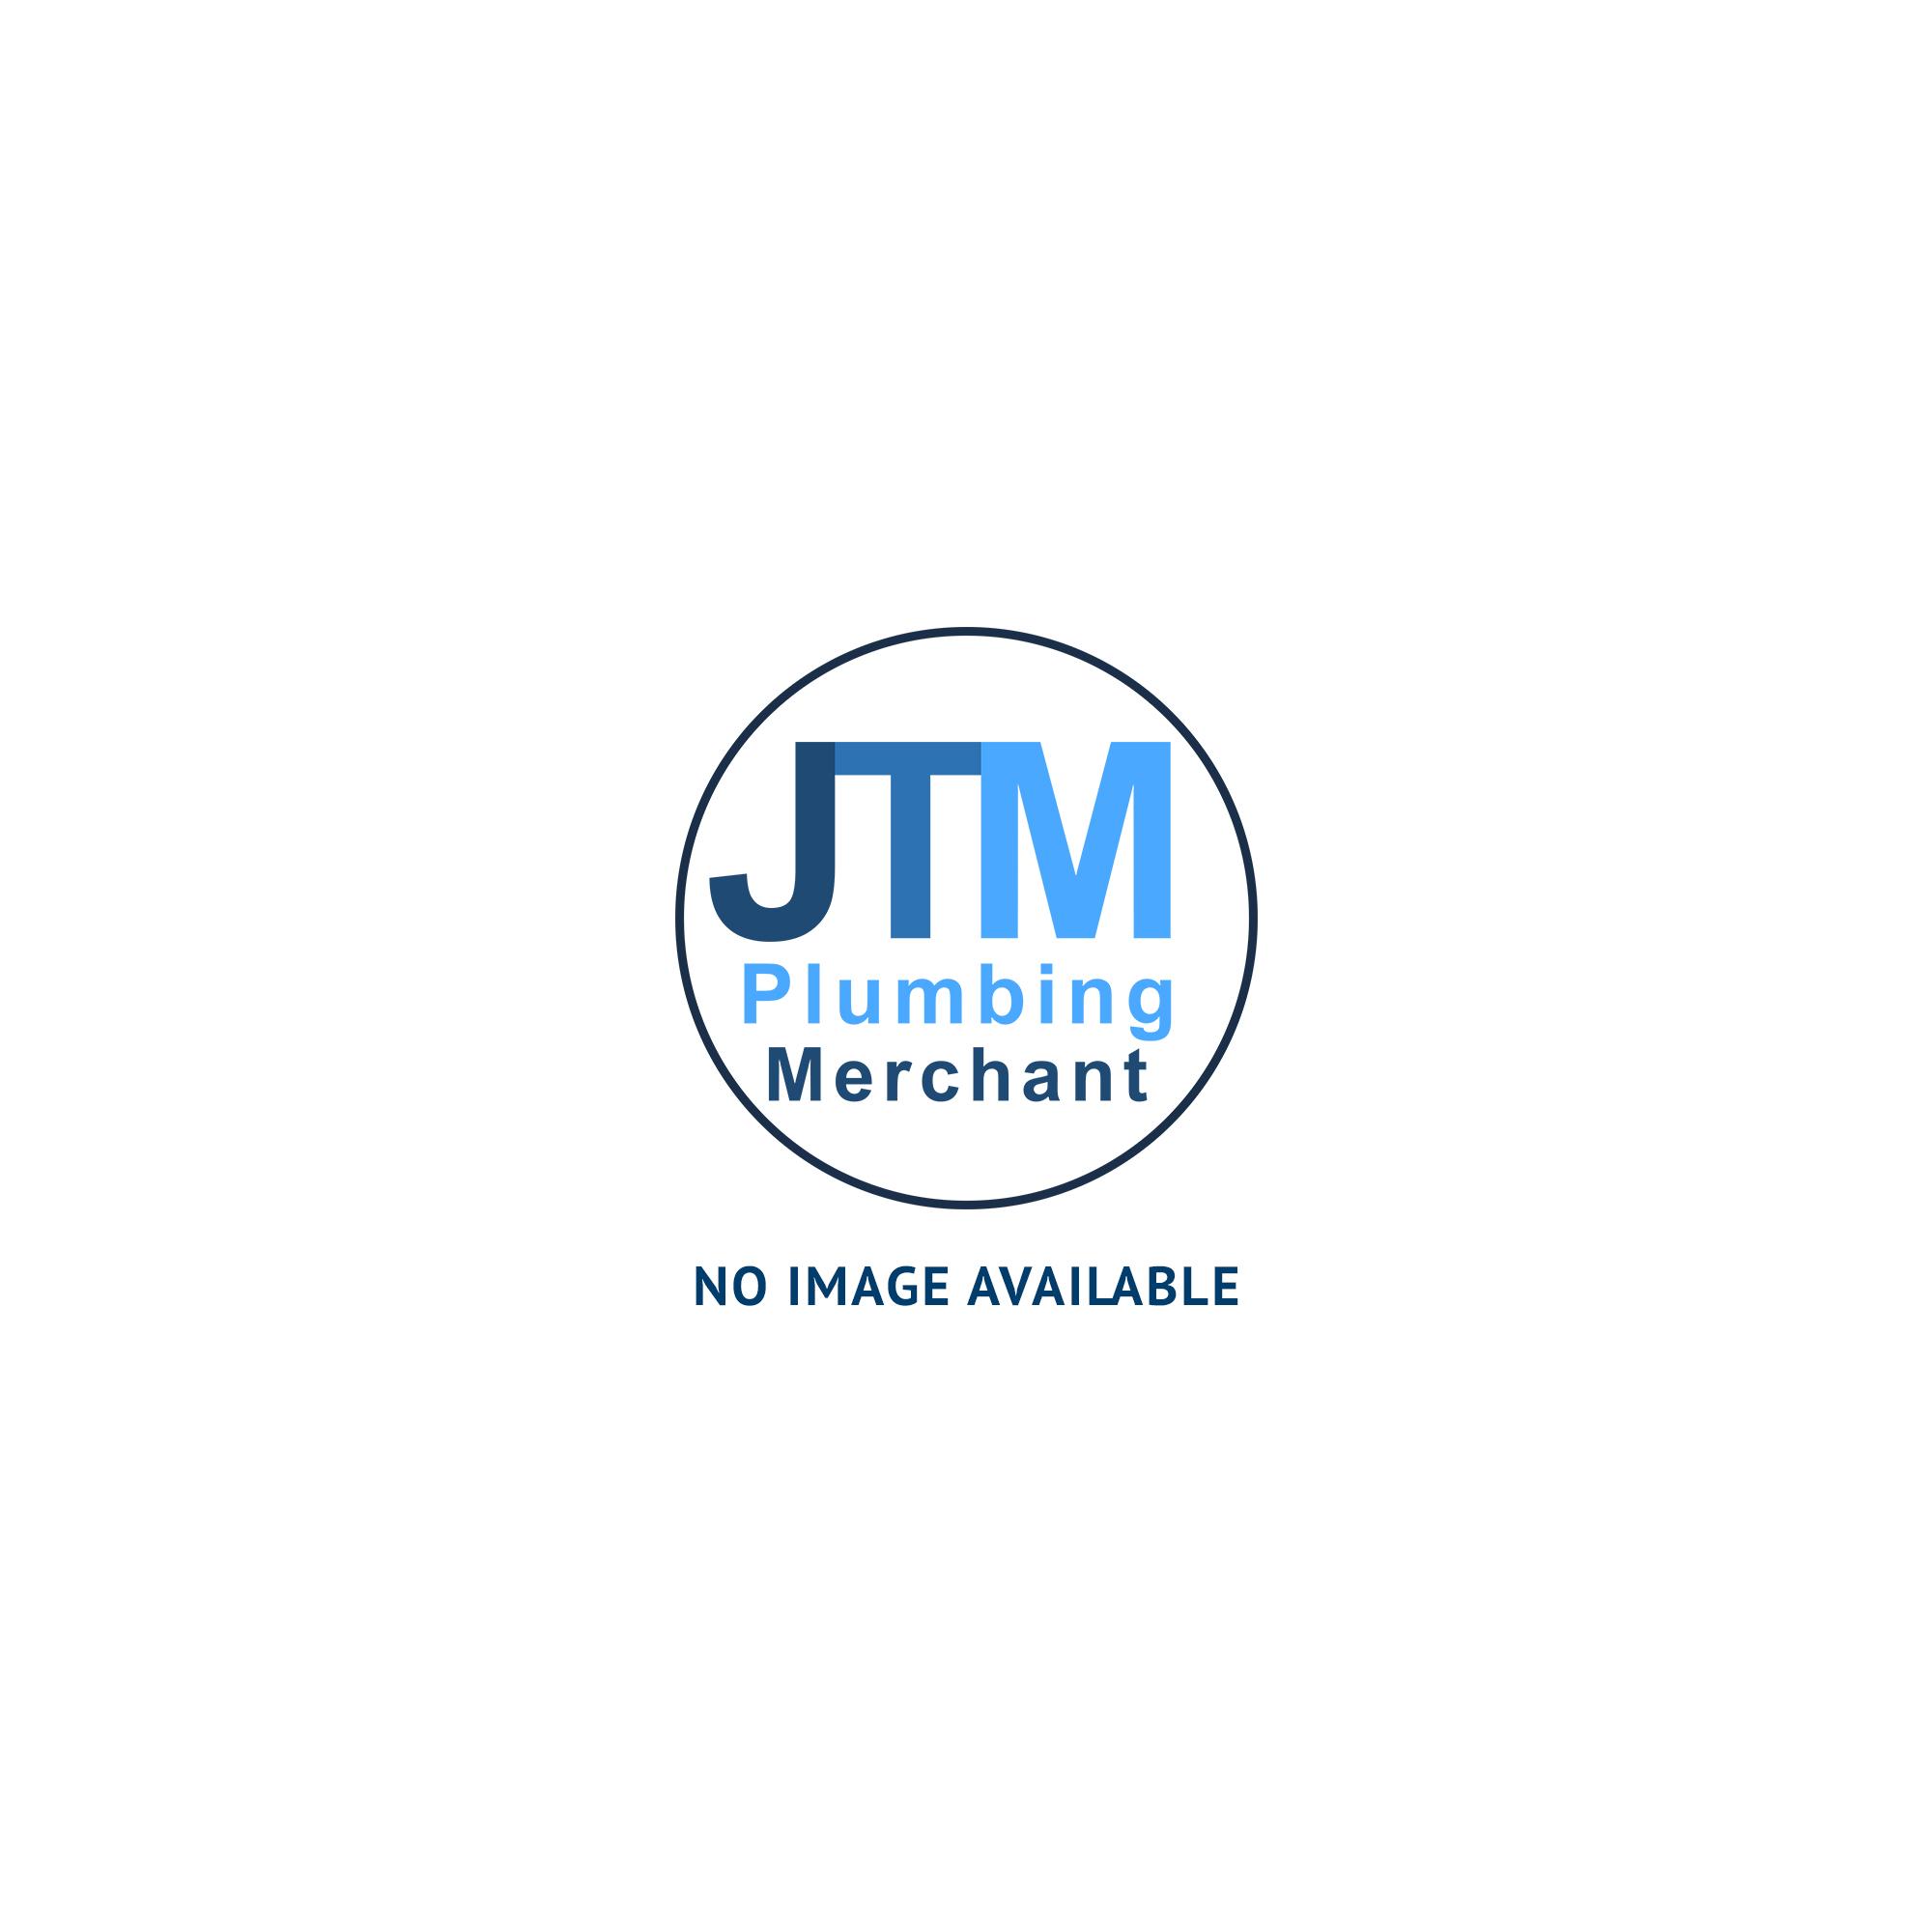 Exceptional JTM Decorative Malleable Iron Screwed Floor Flanges (TYPE 1)   JTM From JTM  Plumbing Limited UK